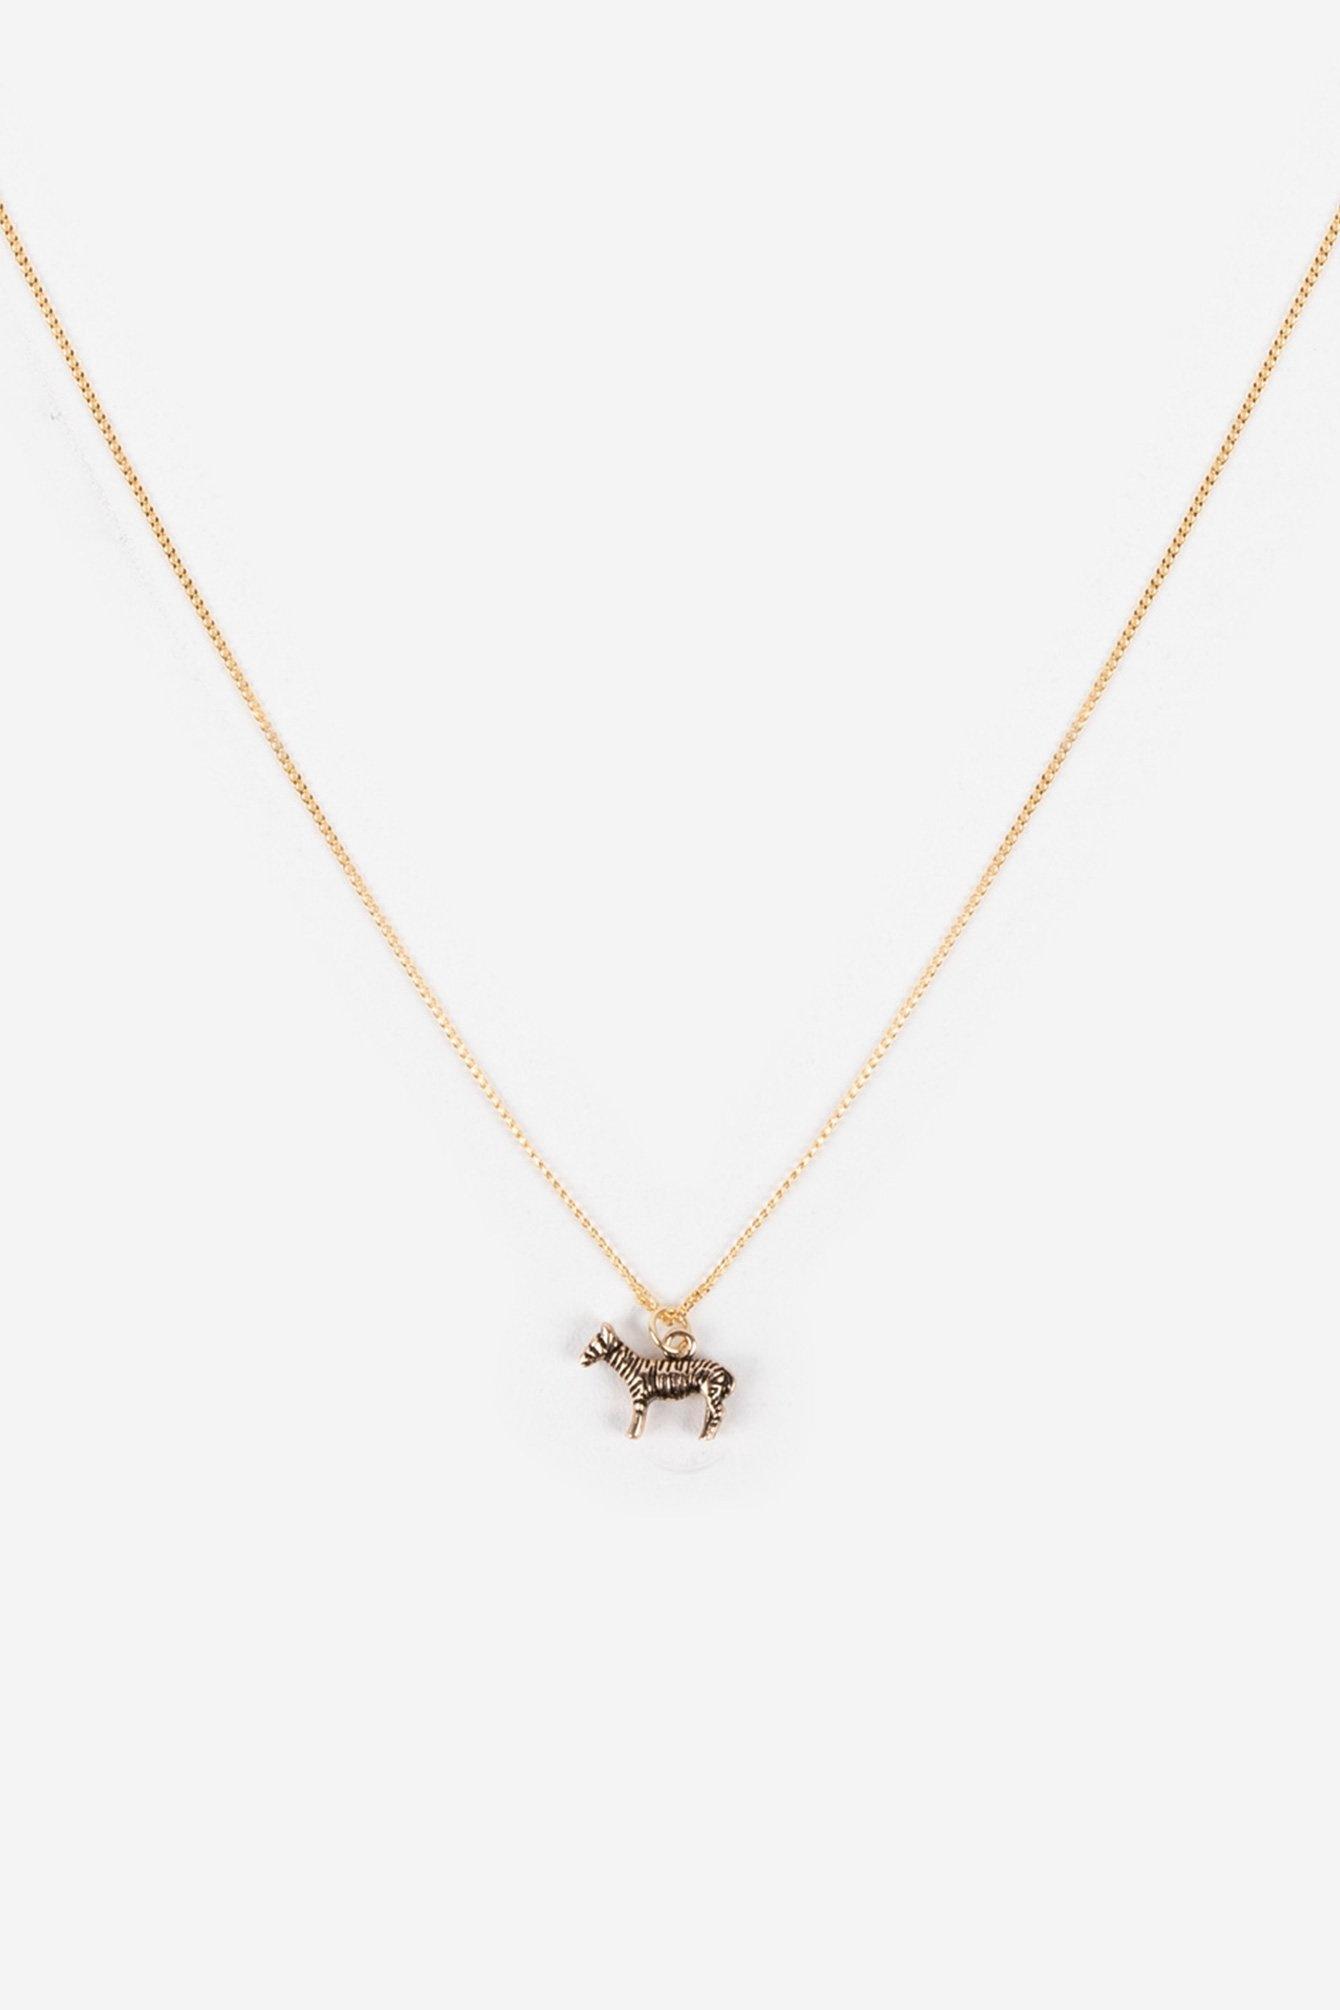 Animal chain gold